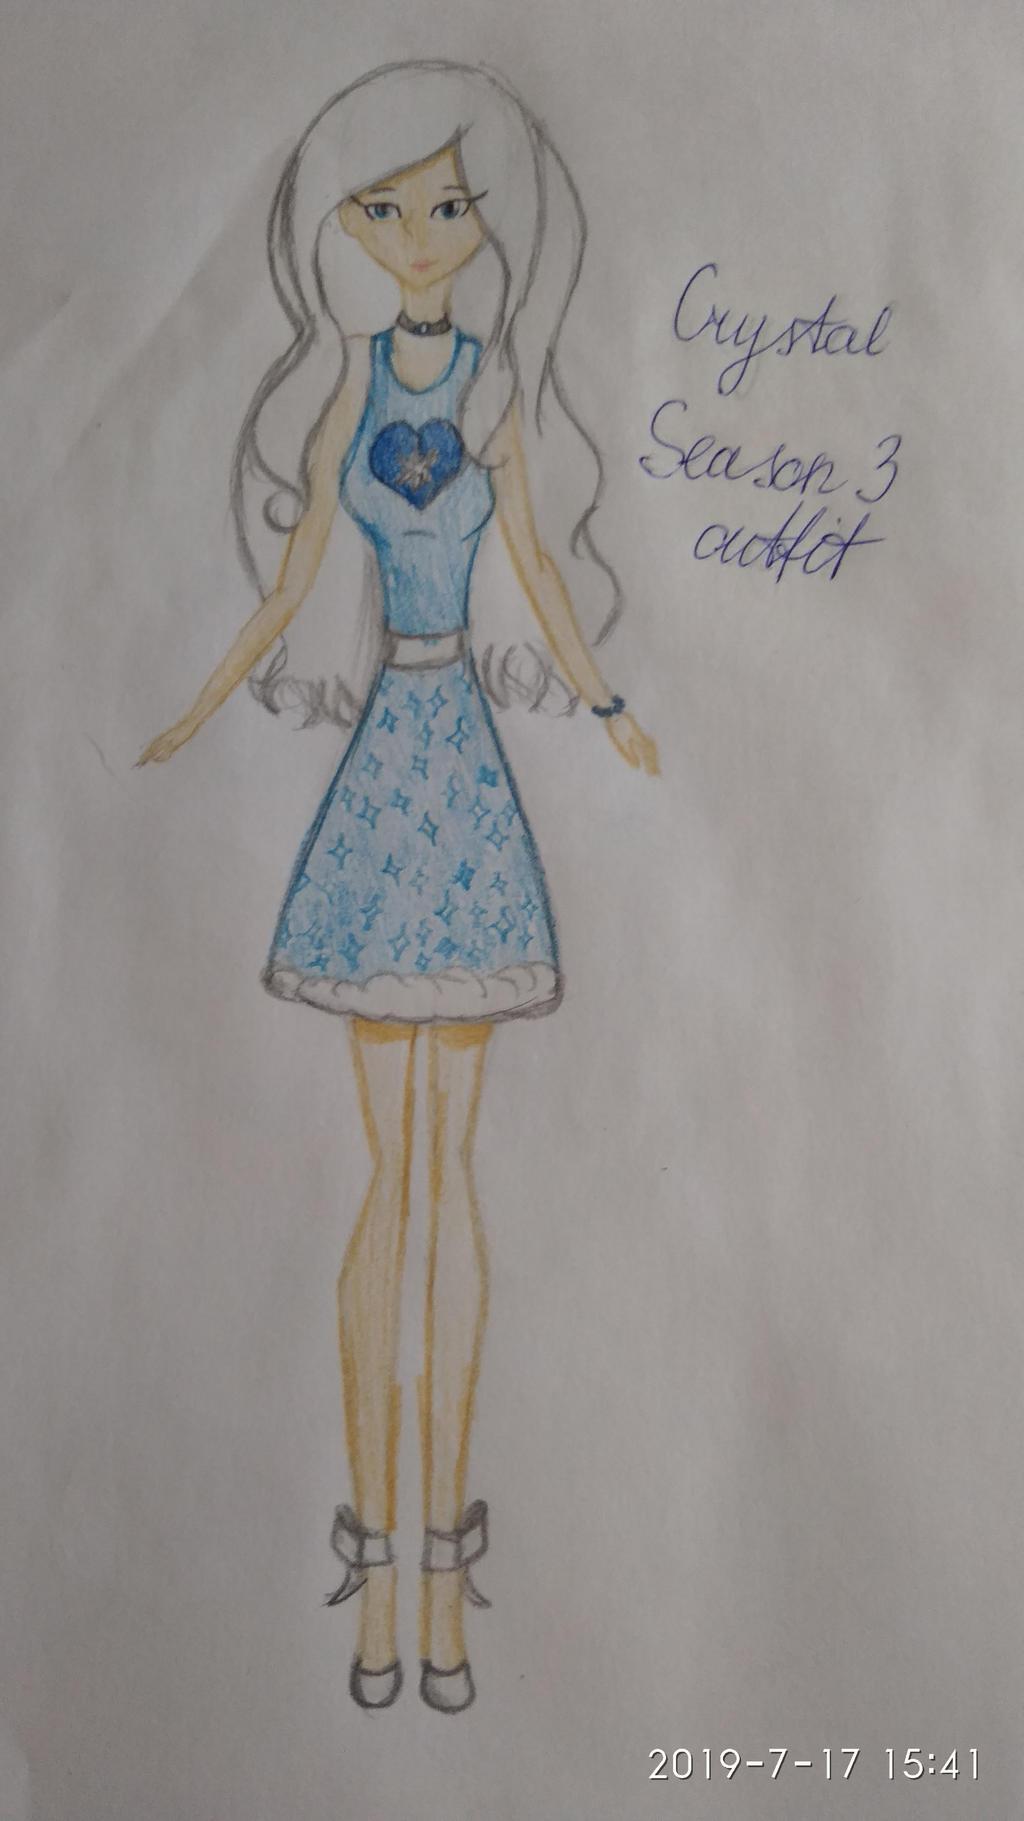 Crystal Season 3 outfit (Winx Club OC) by SimonaAlex on DeviantArt